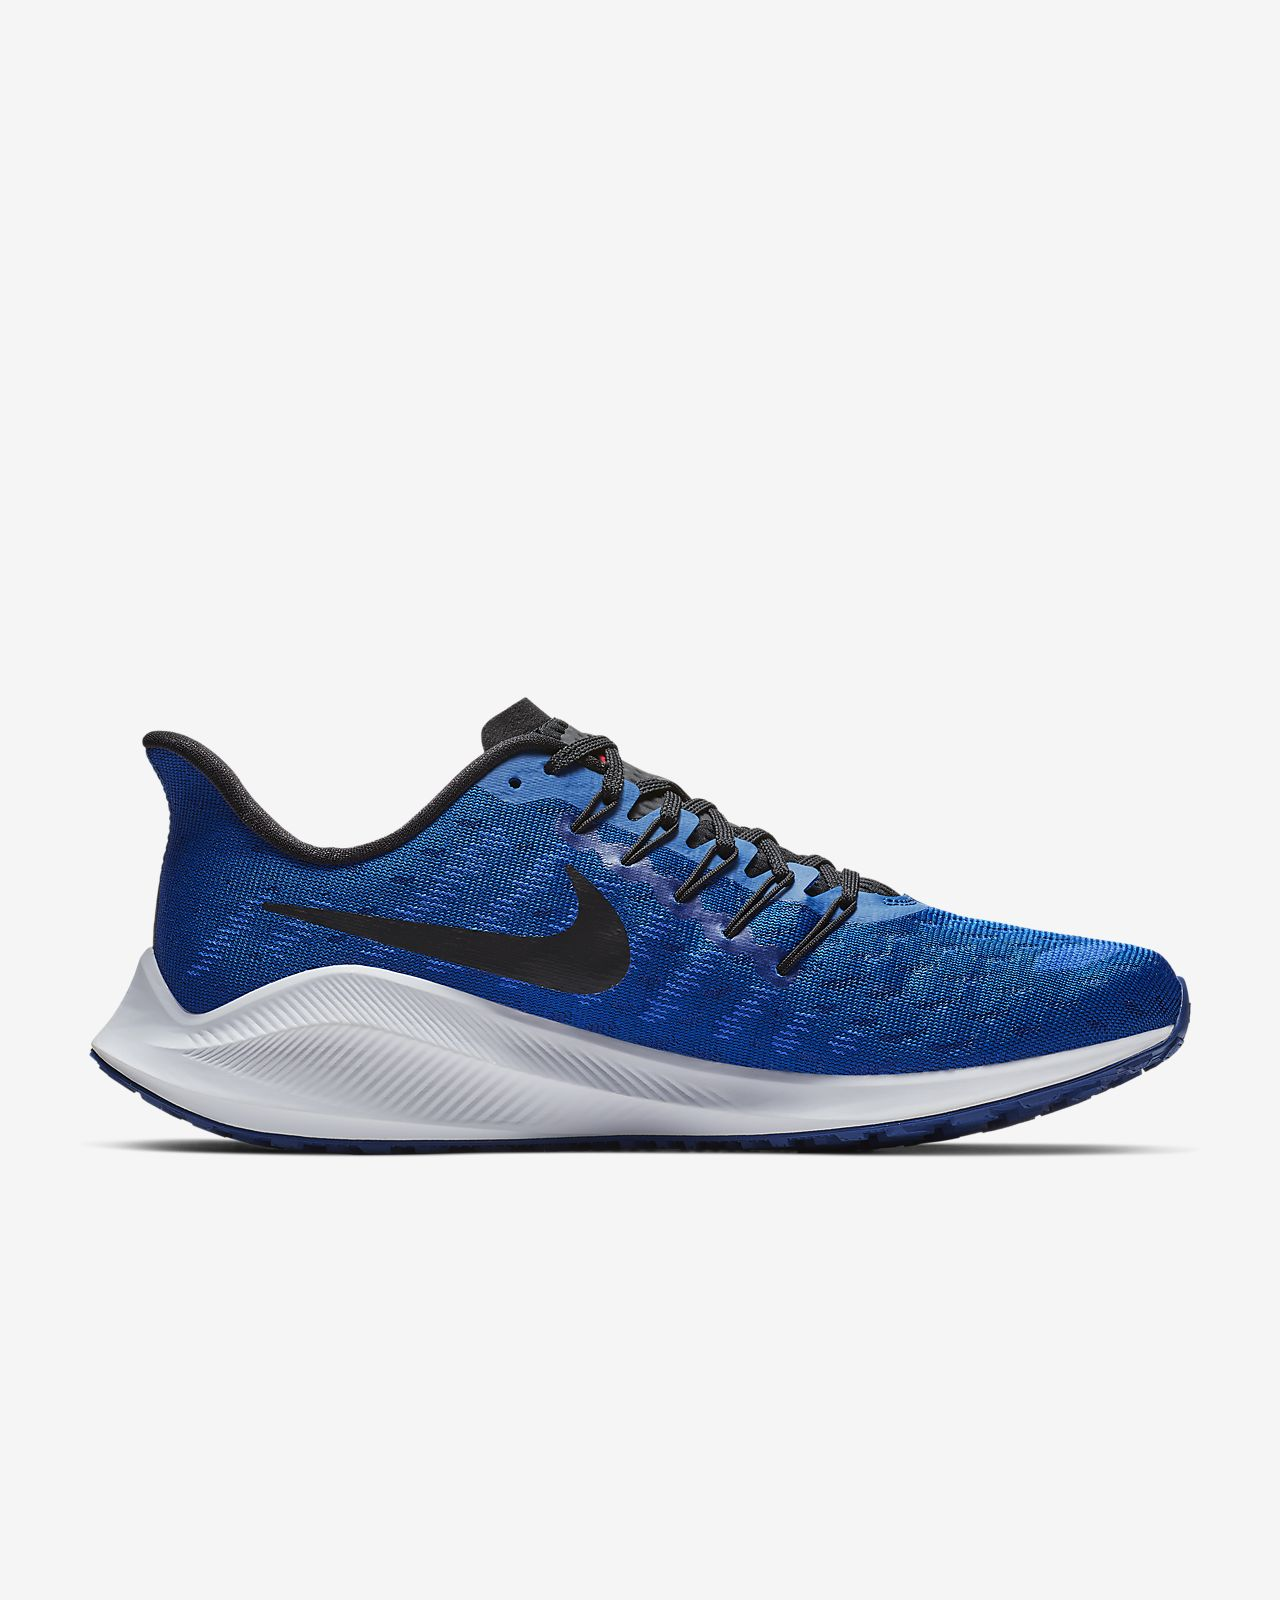 a9b1a4a263278 Nike Air Zoom Vomero 14 Zapatillas de running - Hombre. Nike.com ES